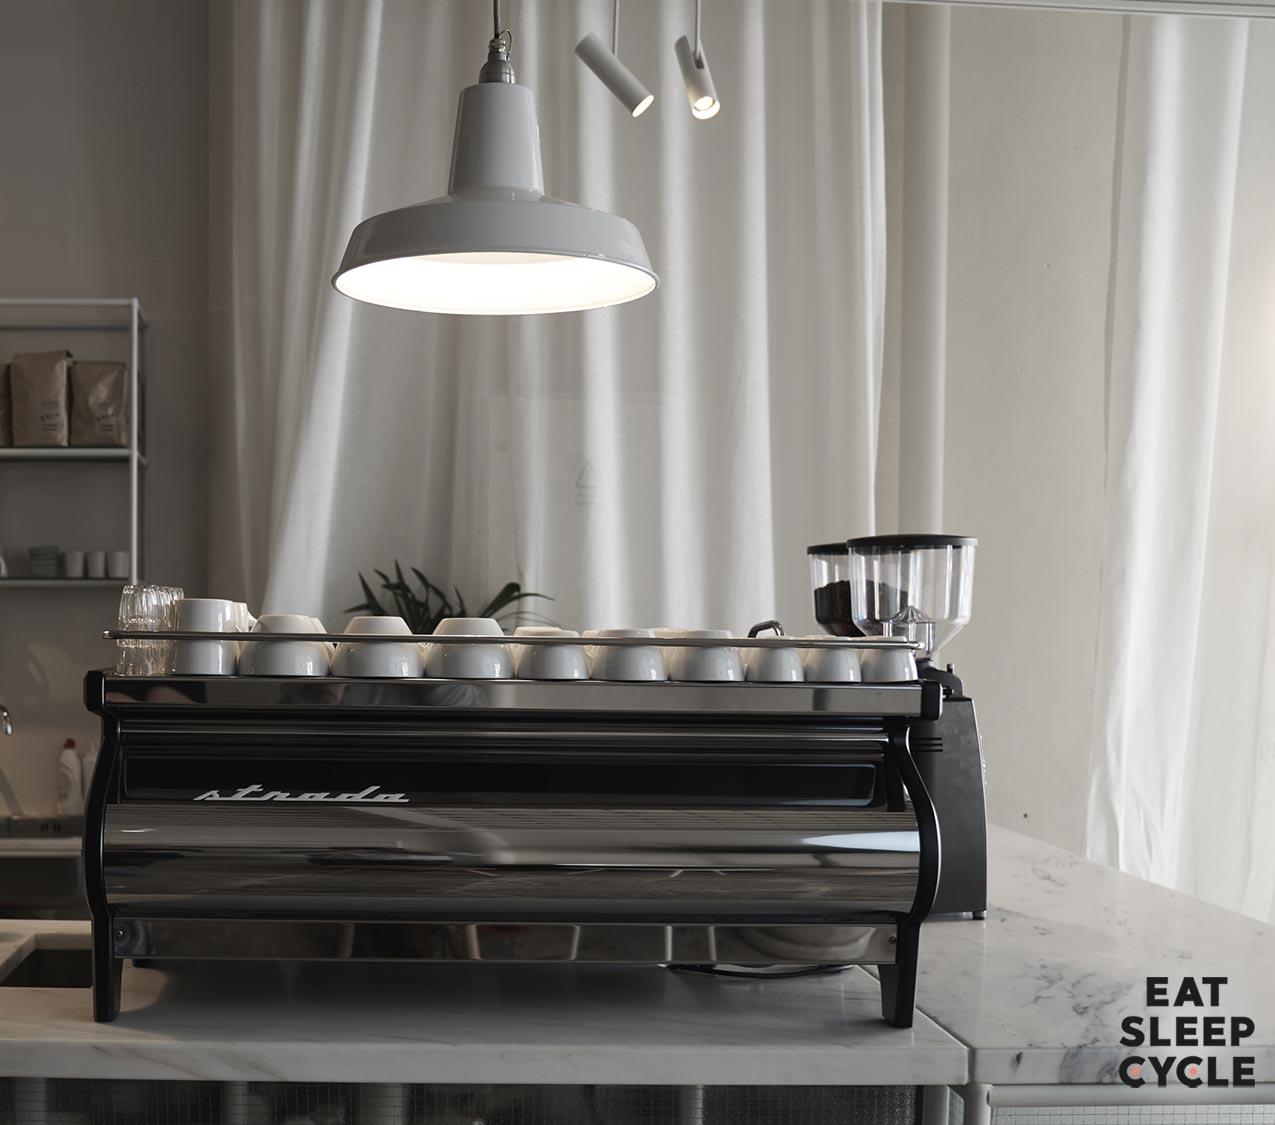 laEat-Sleep-Cycle-Hub-Cafe-Crowdfunding-La-Marzocco-Cafe